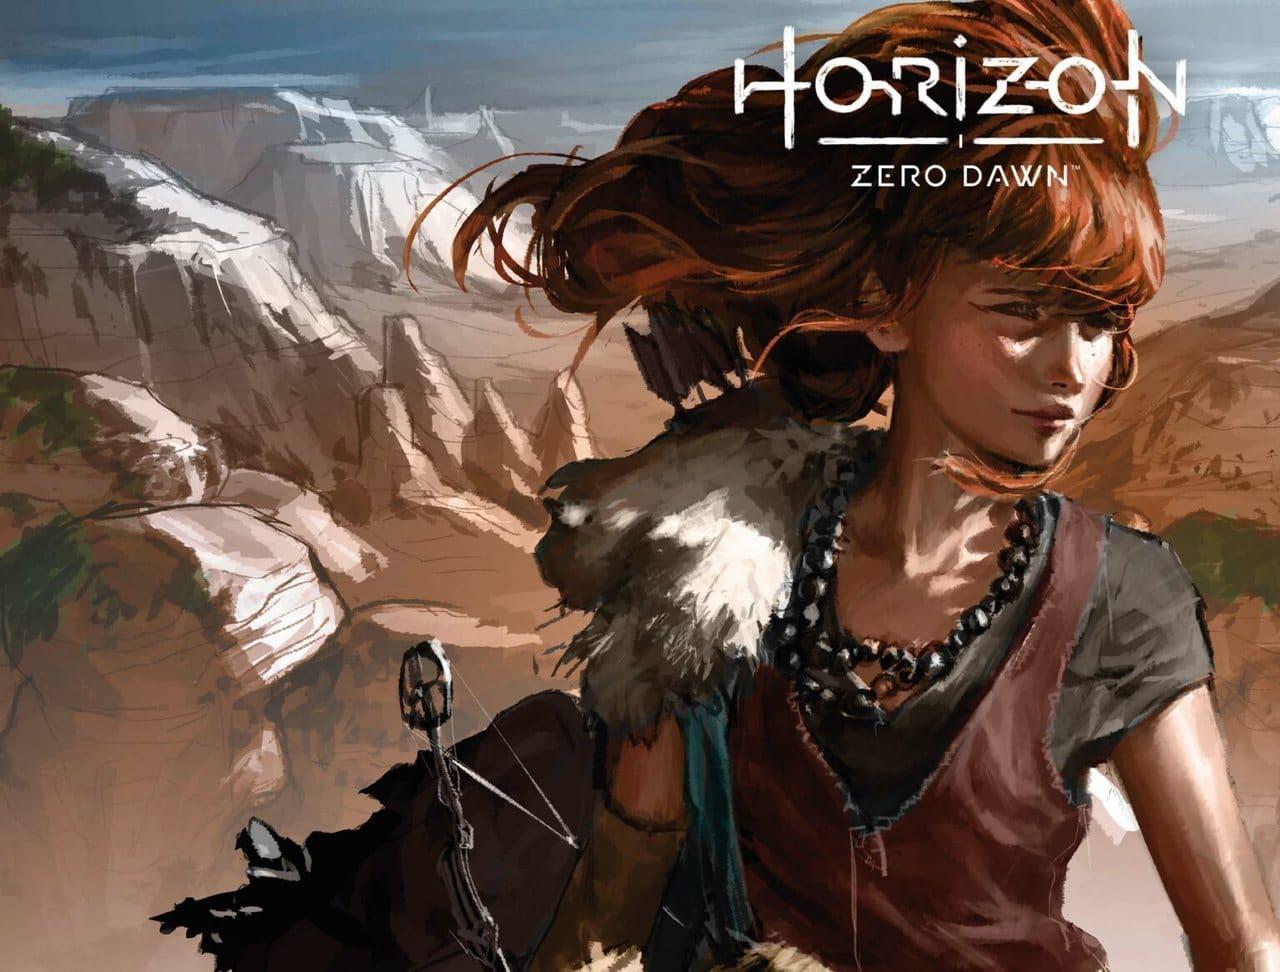 Imagem da Aloy pequena na HQ de Horizon Zero Dawn